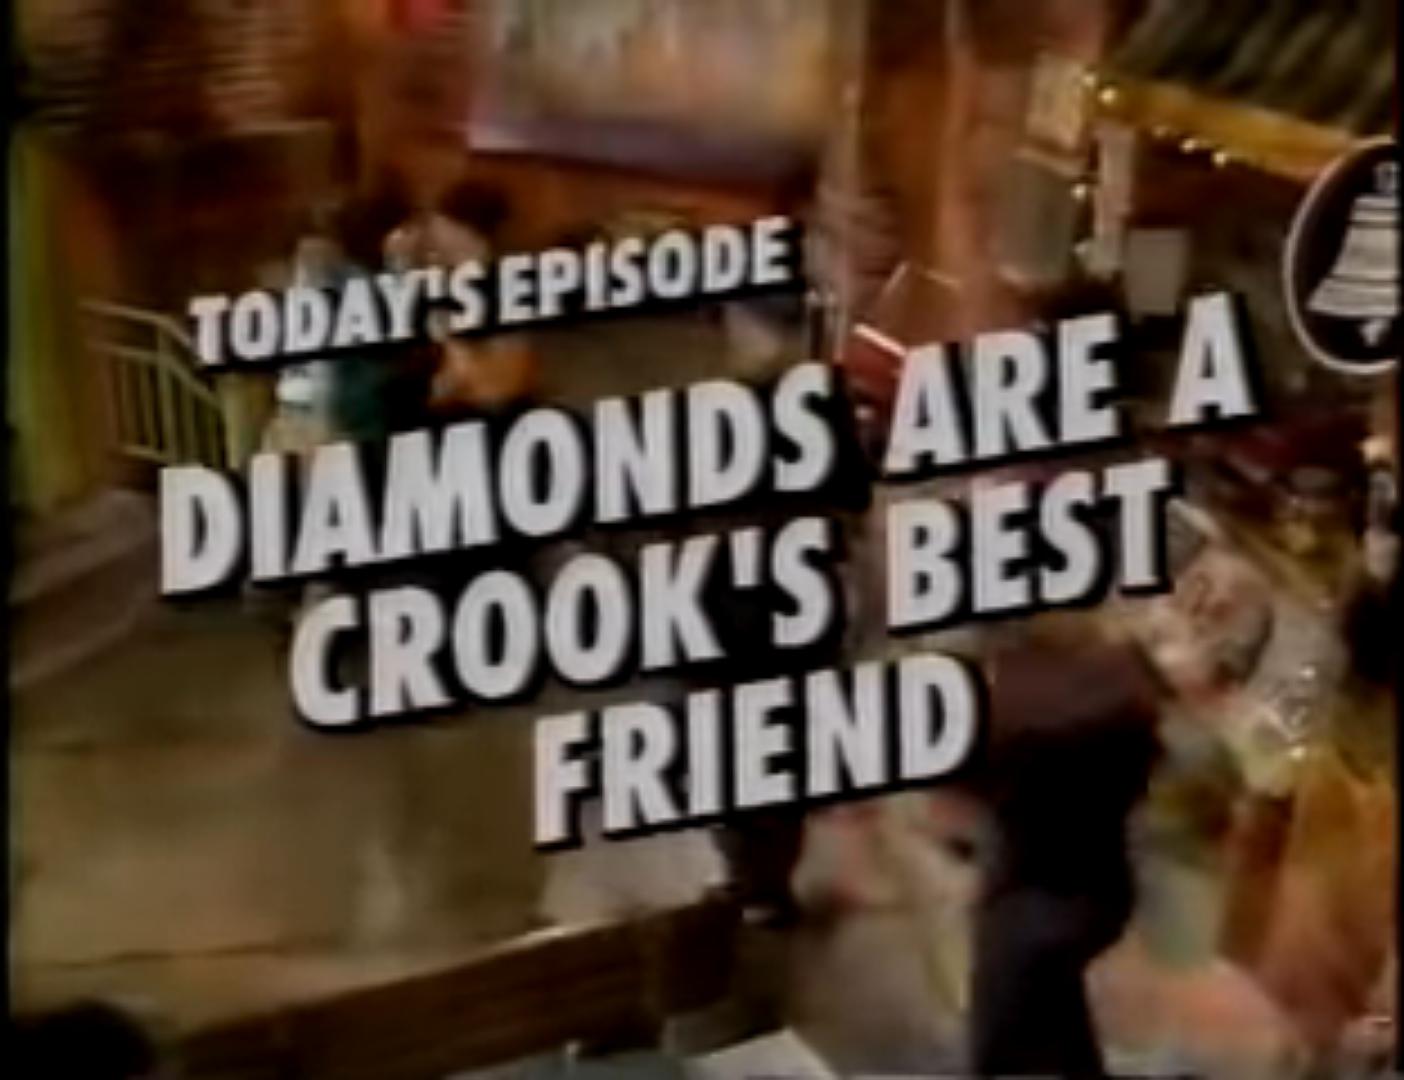 Diamonds Are a Crook's Best Friend